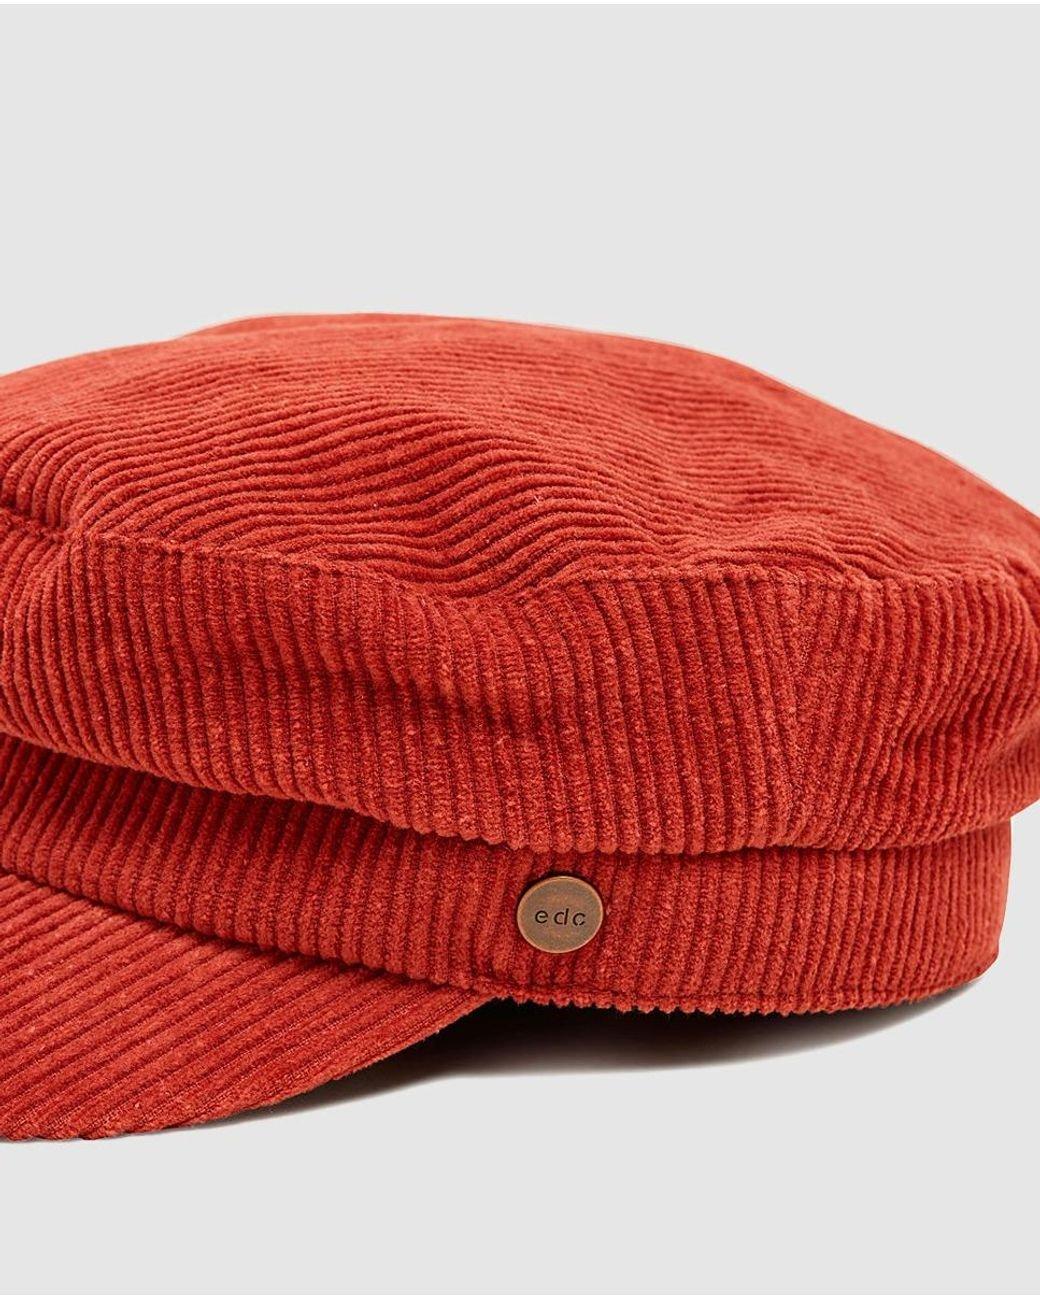 ESPRIT Womens Panama Hat